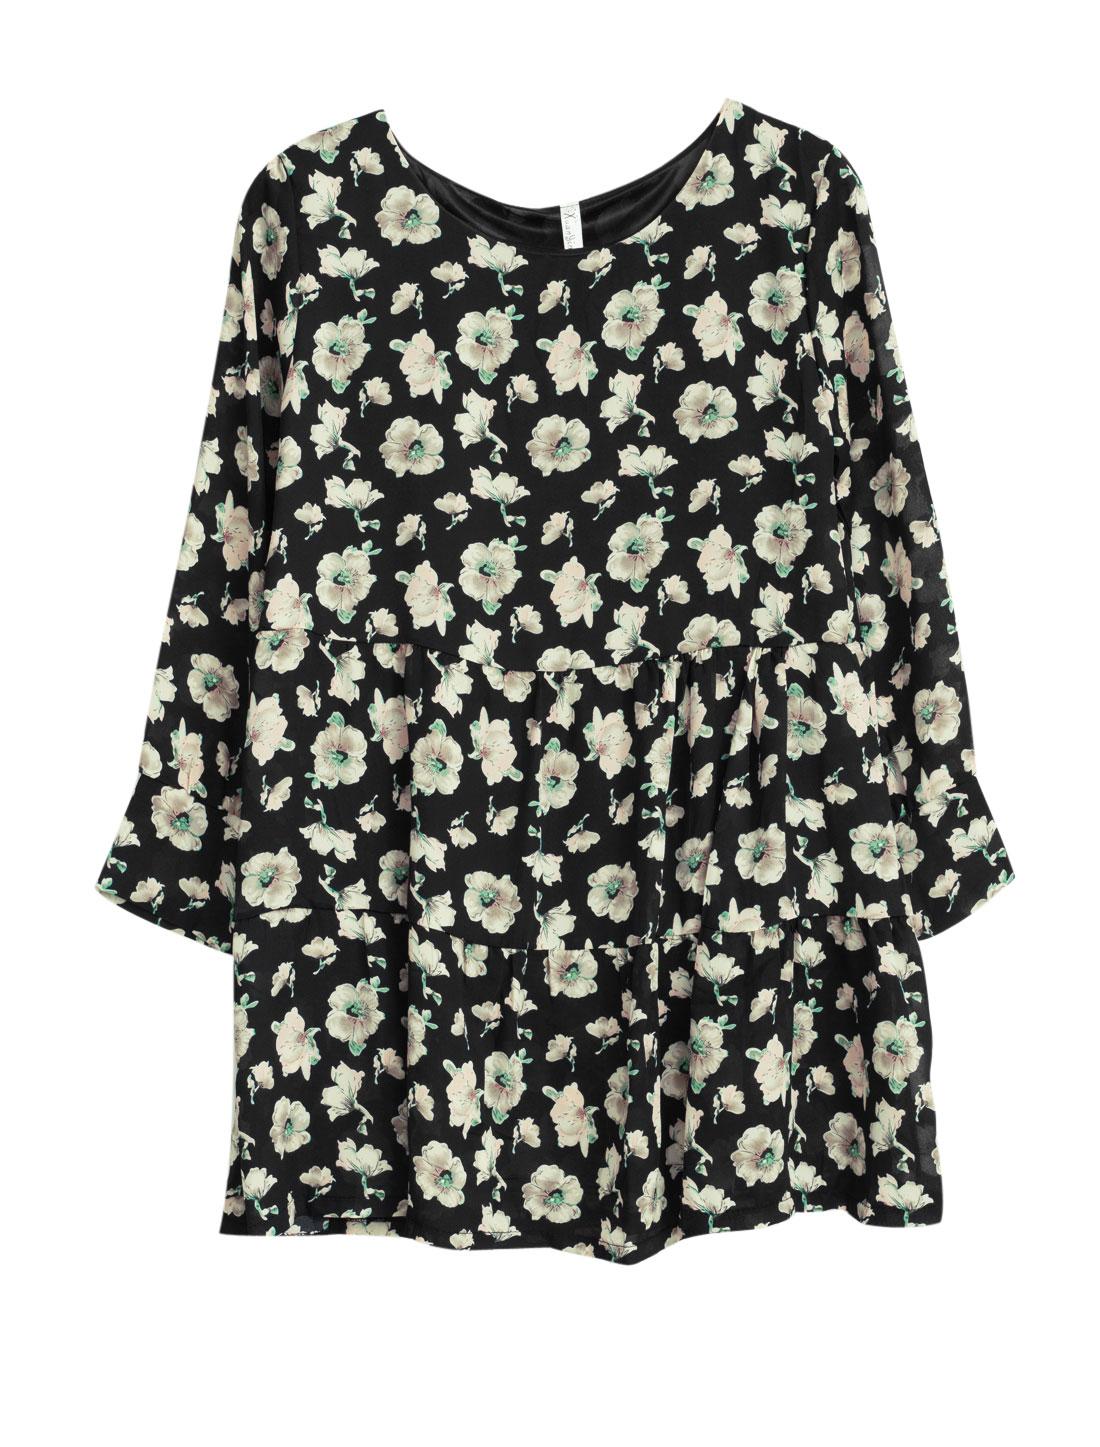 Allegra K Lady Floral Prints Long Sleeves Playful Pleats Pullover Chiffon Dress Black S